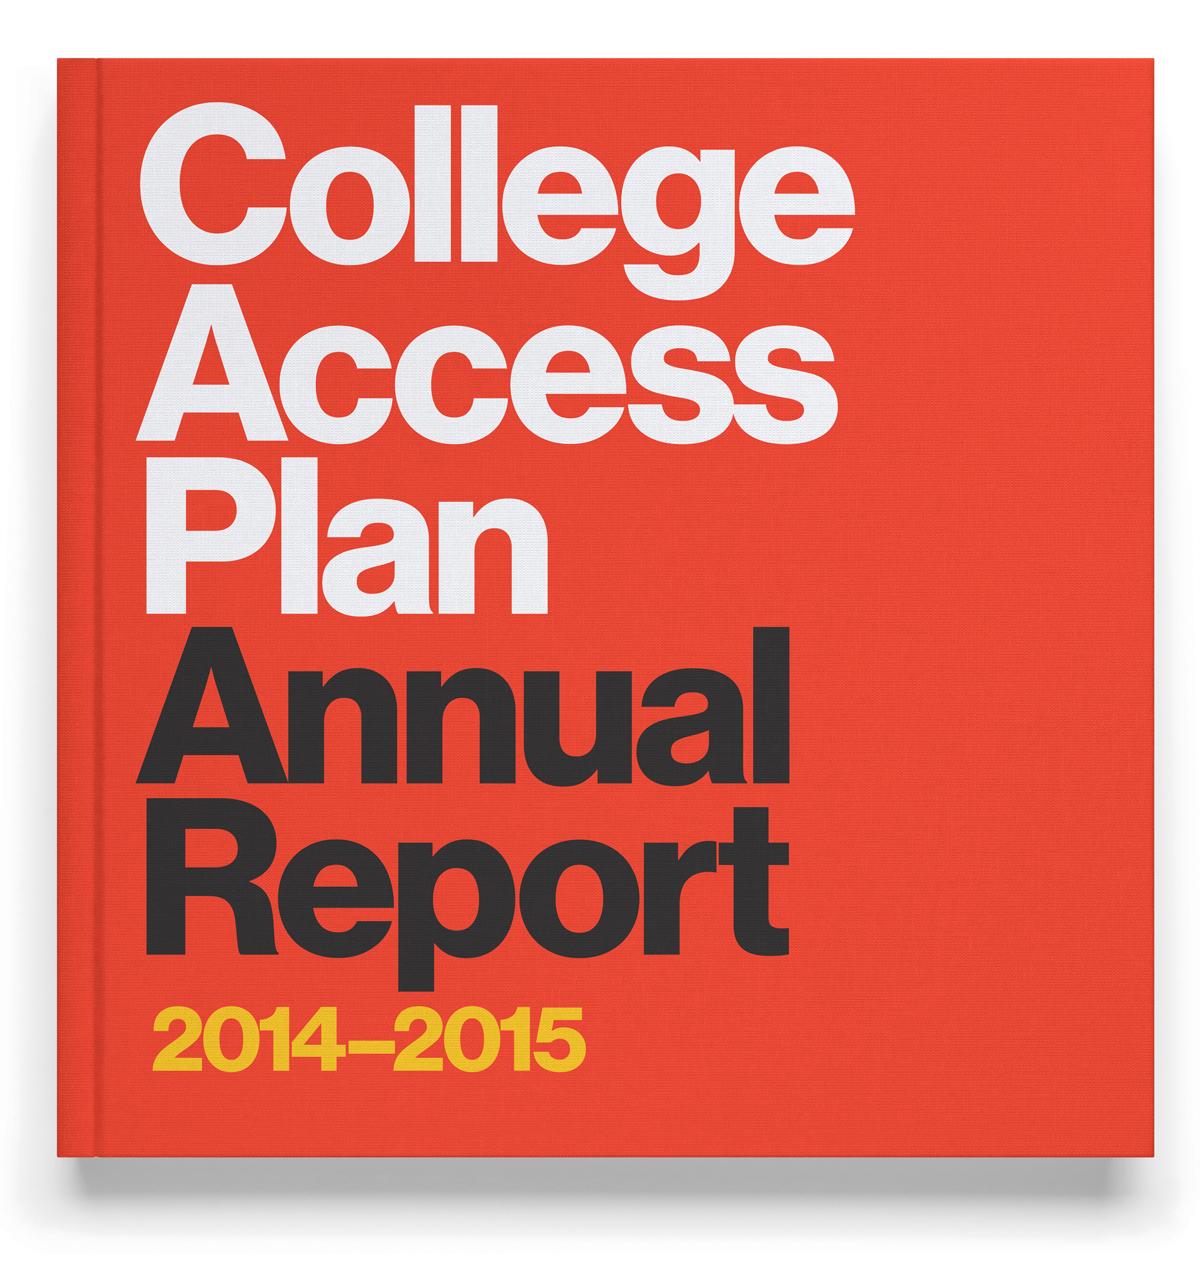 College Access Plan